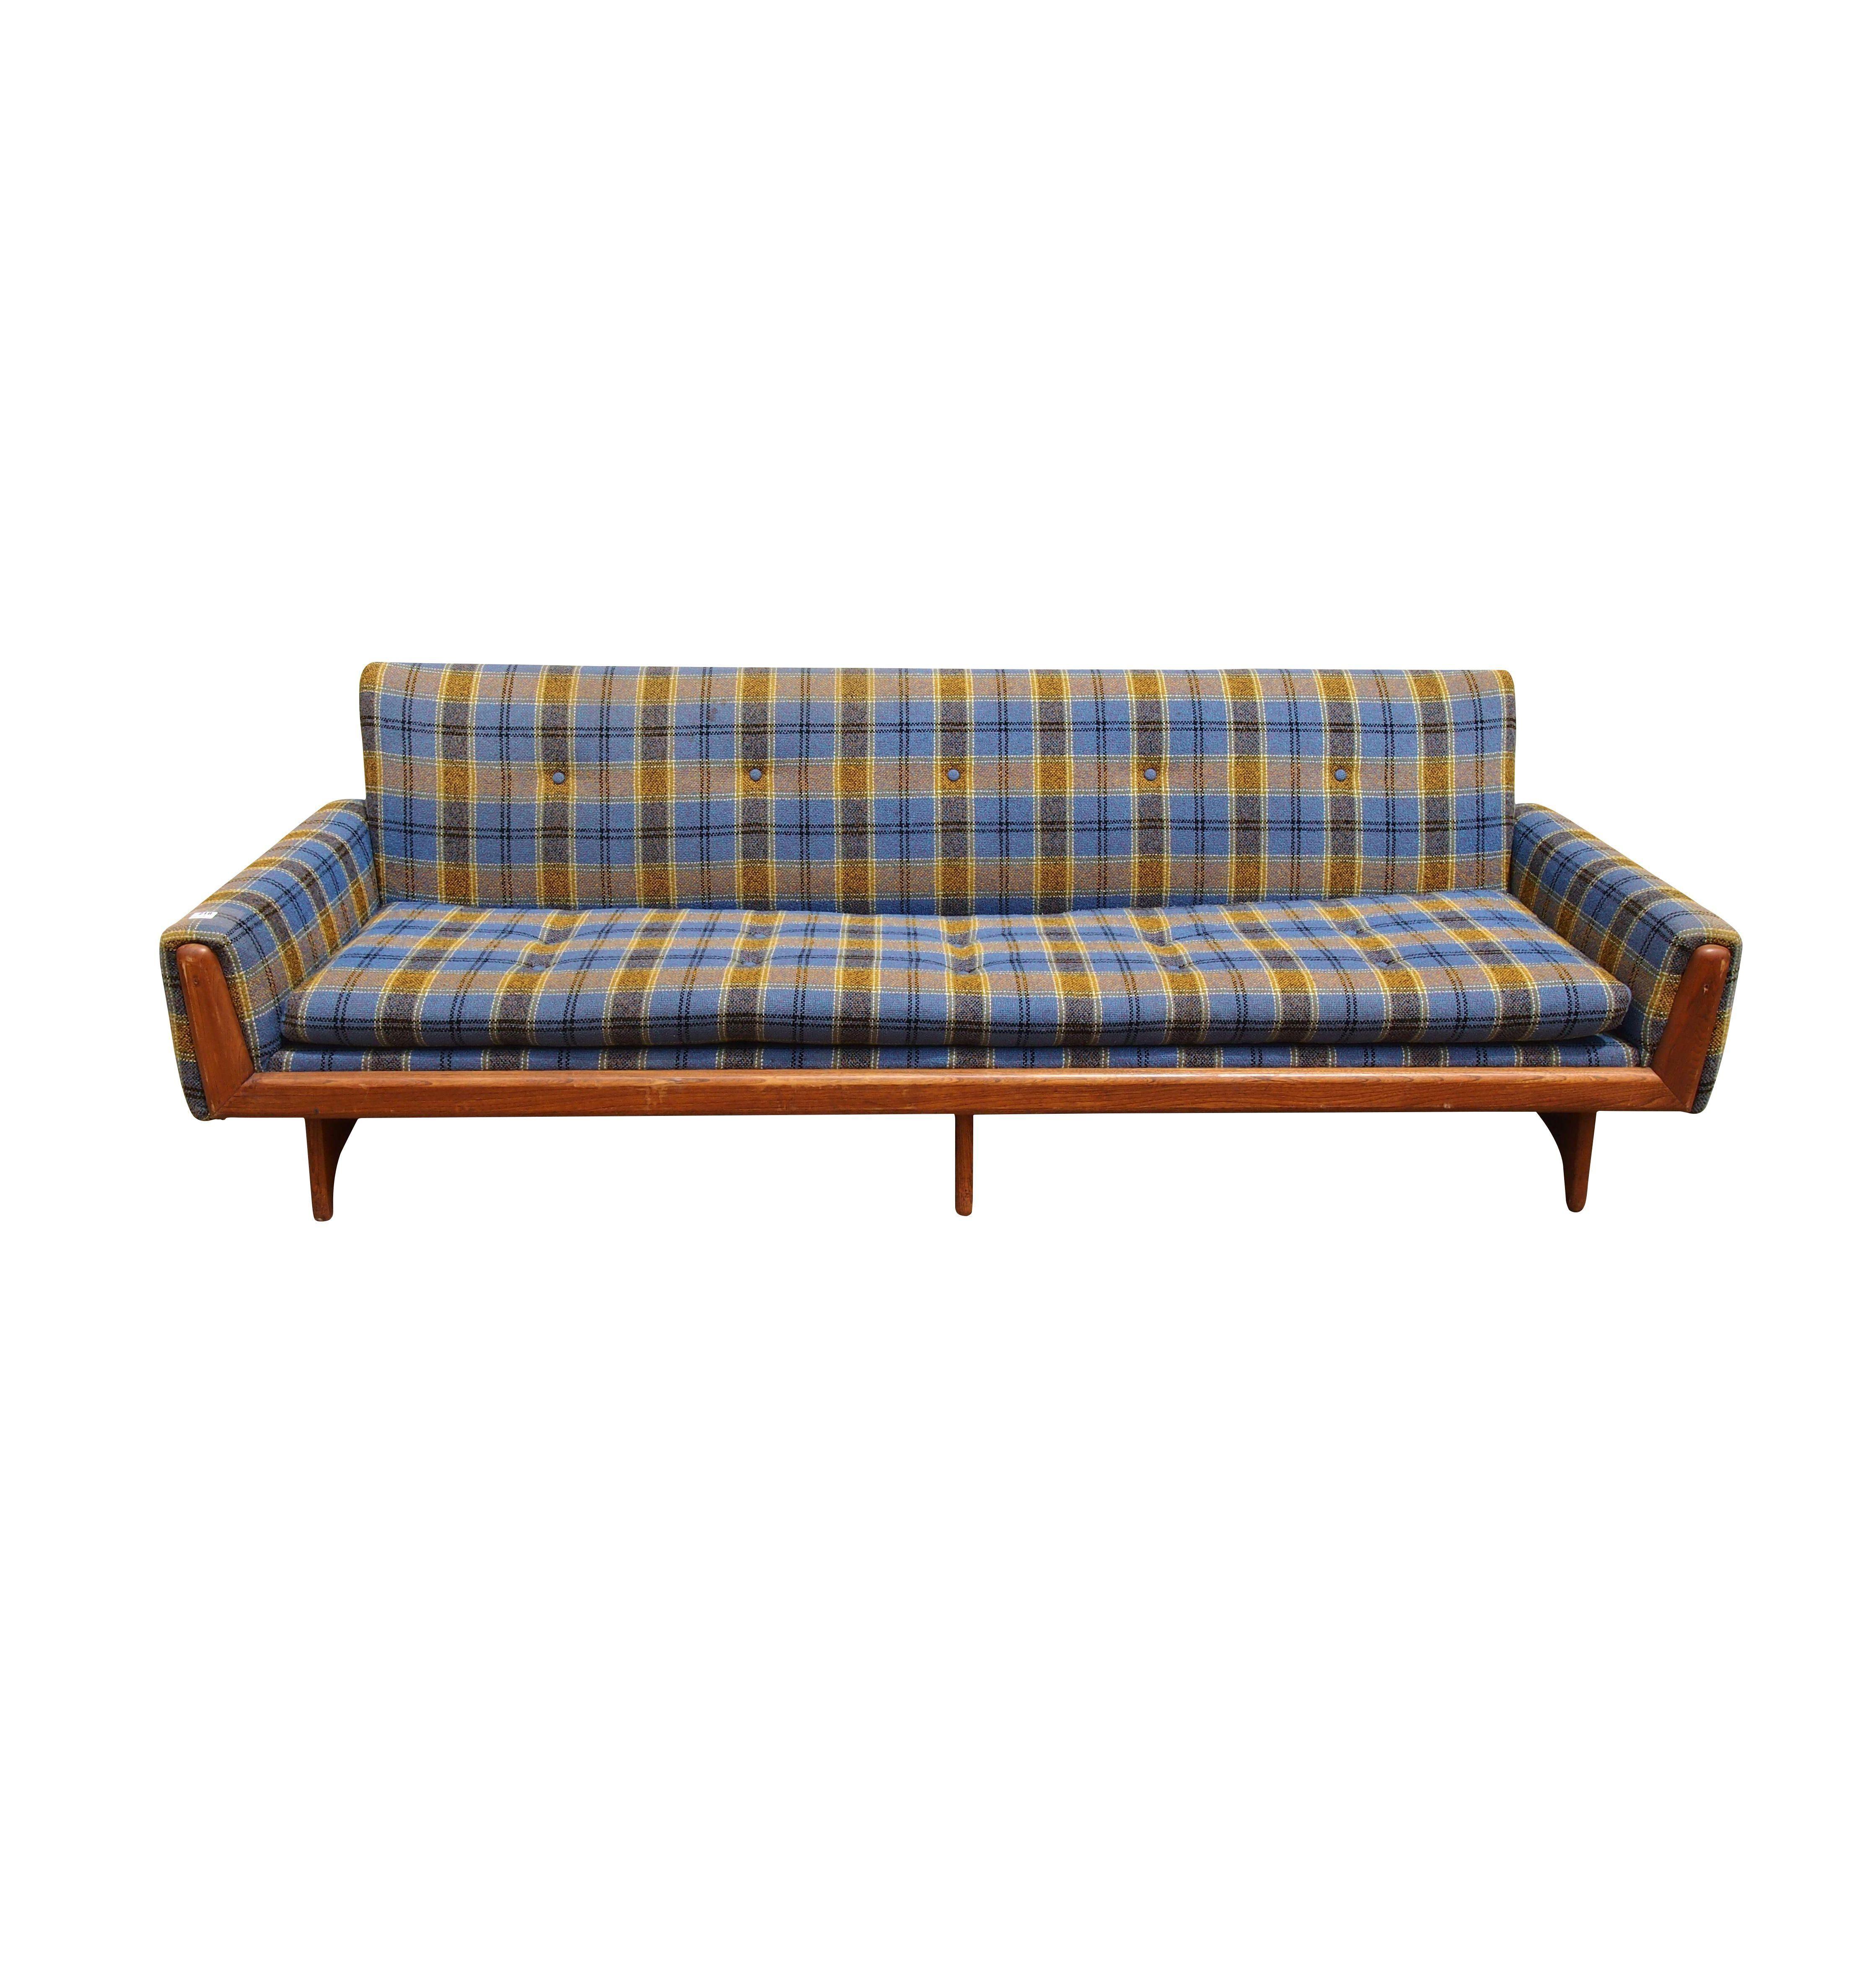 used modern of design lovely that stores unique sofas buy hd furniture fresh gunstig die sofa couches kaufen